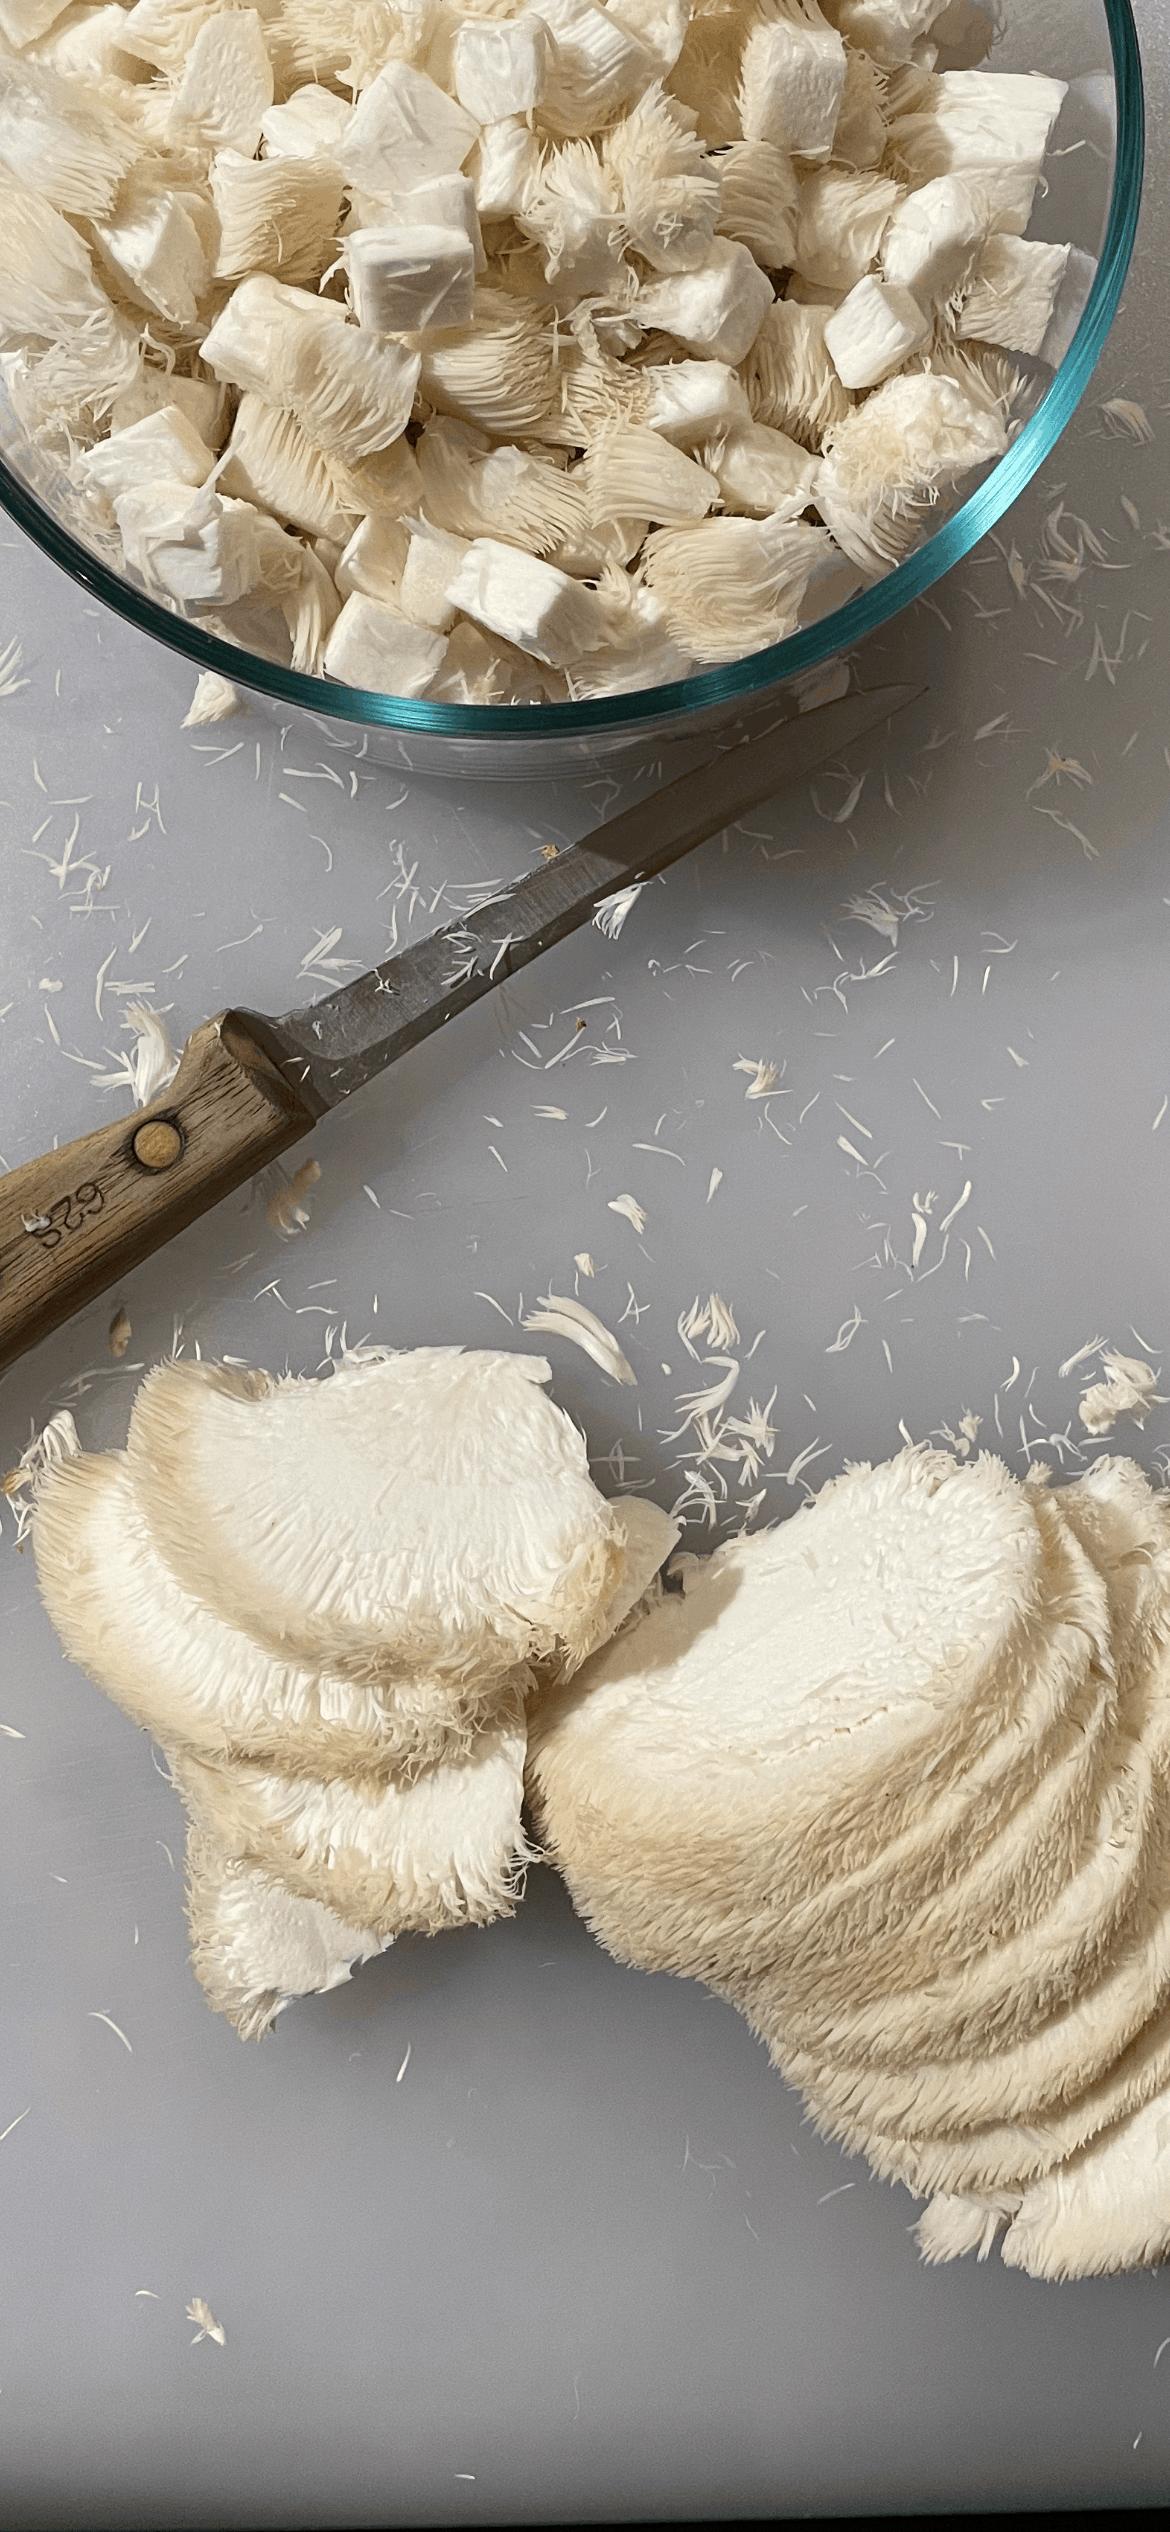 Slicing Your Mushrooms